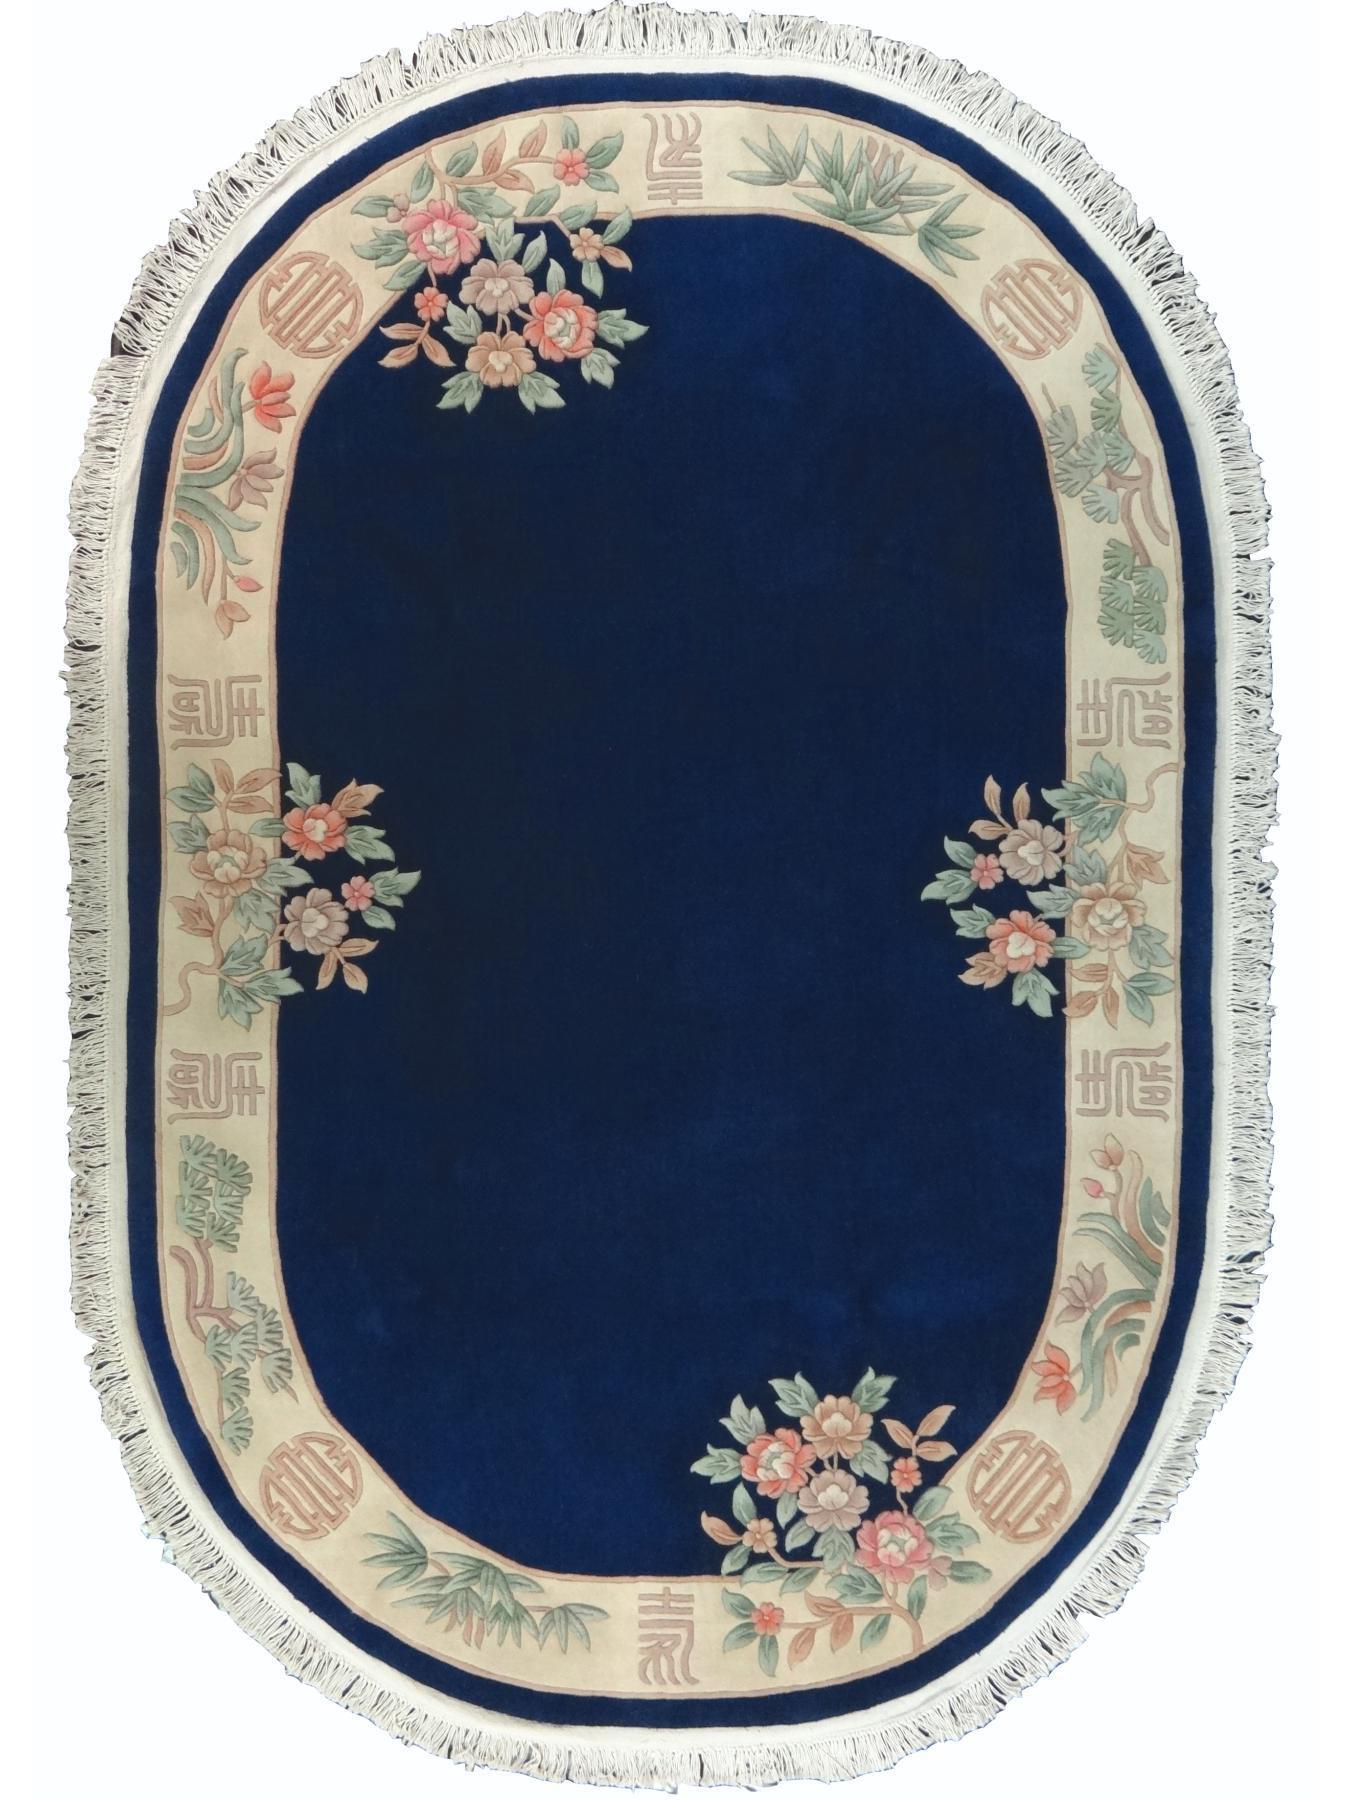 kangshi 001 bleu marine tapis chinois n 1124 300x200cm. Black Bedroom Furniture Sets. Home Design Ideas